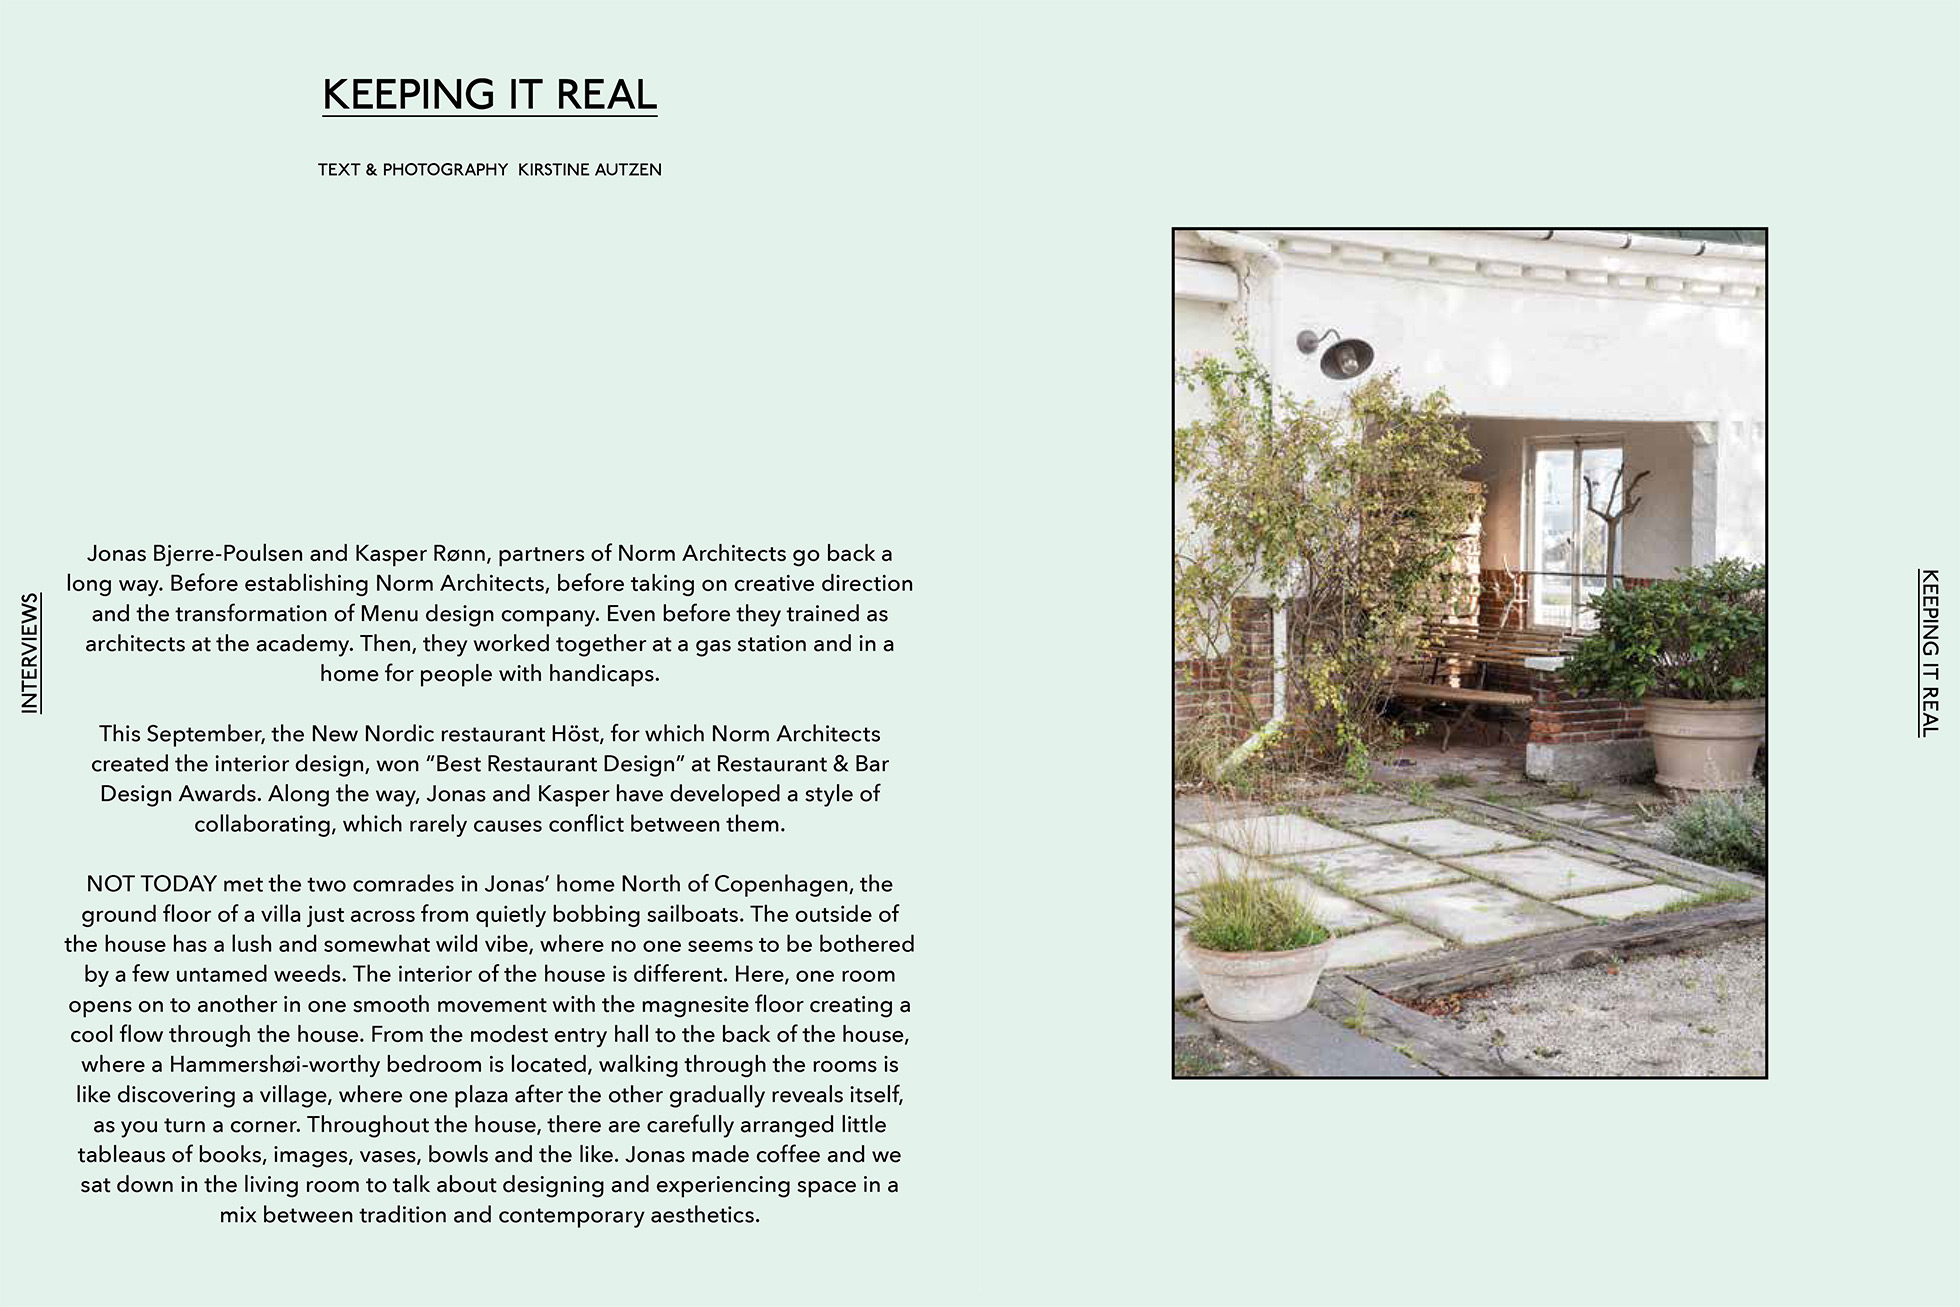 Keeping-it-real_layout-ny1.jpg